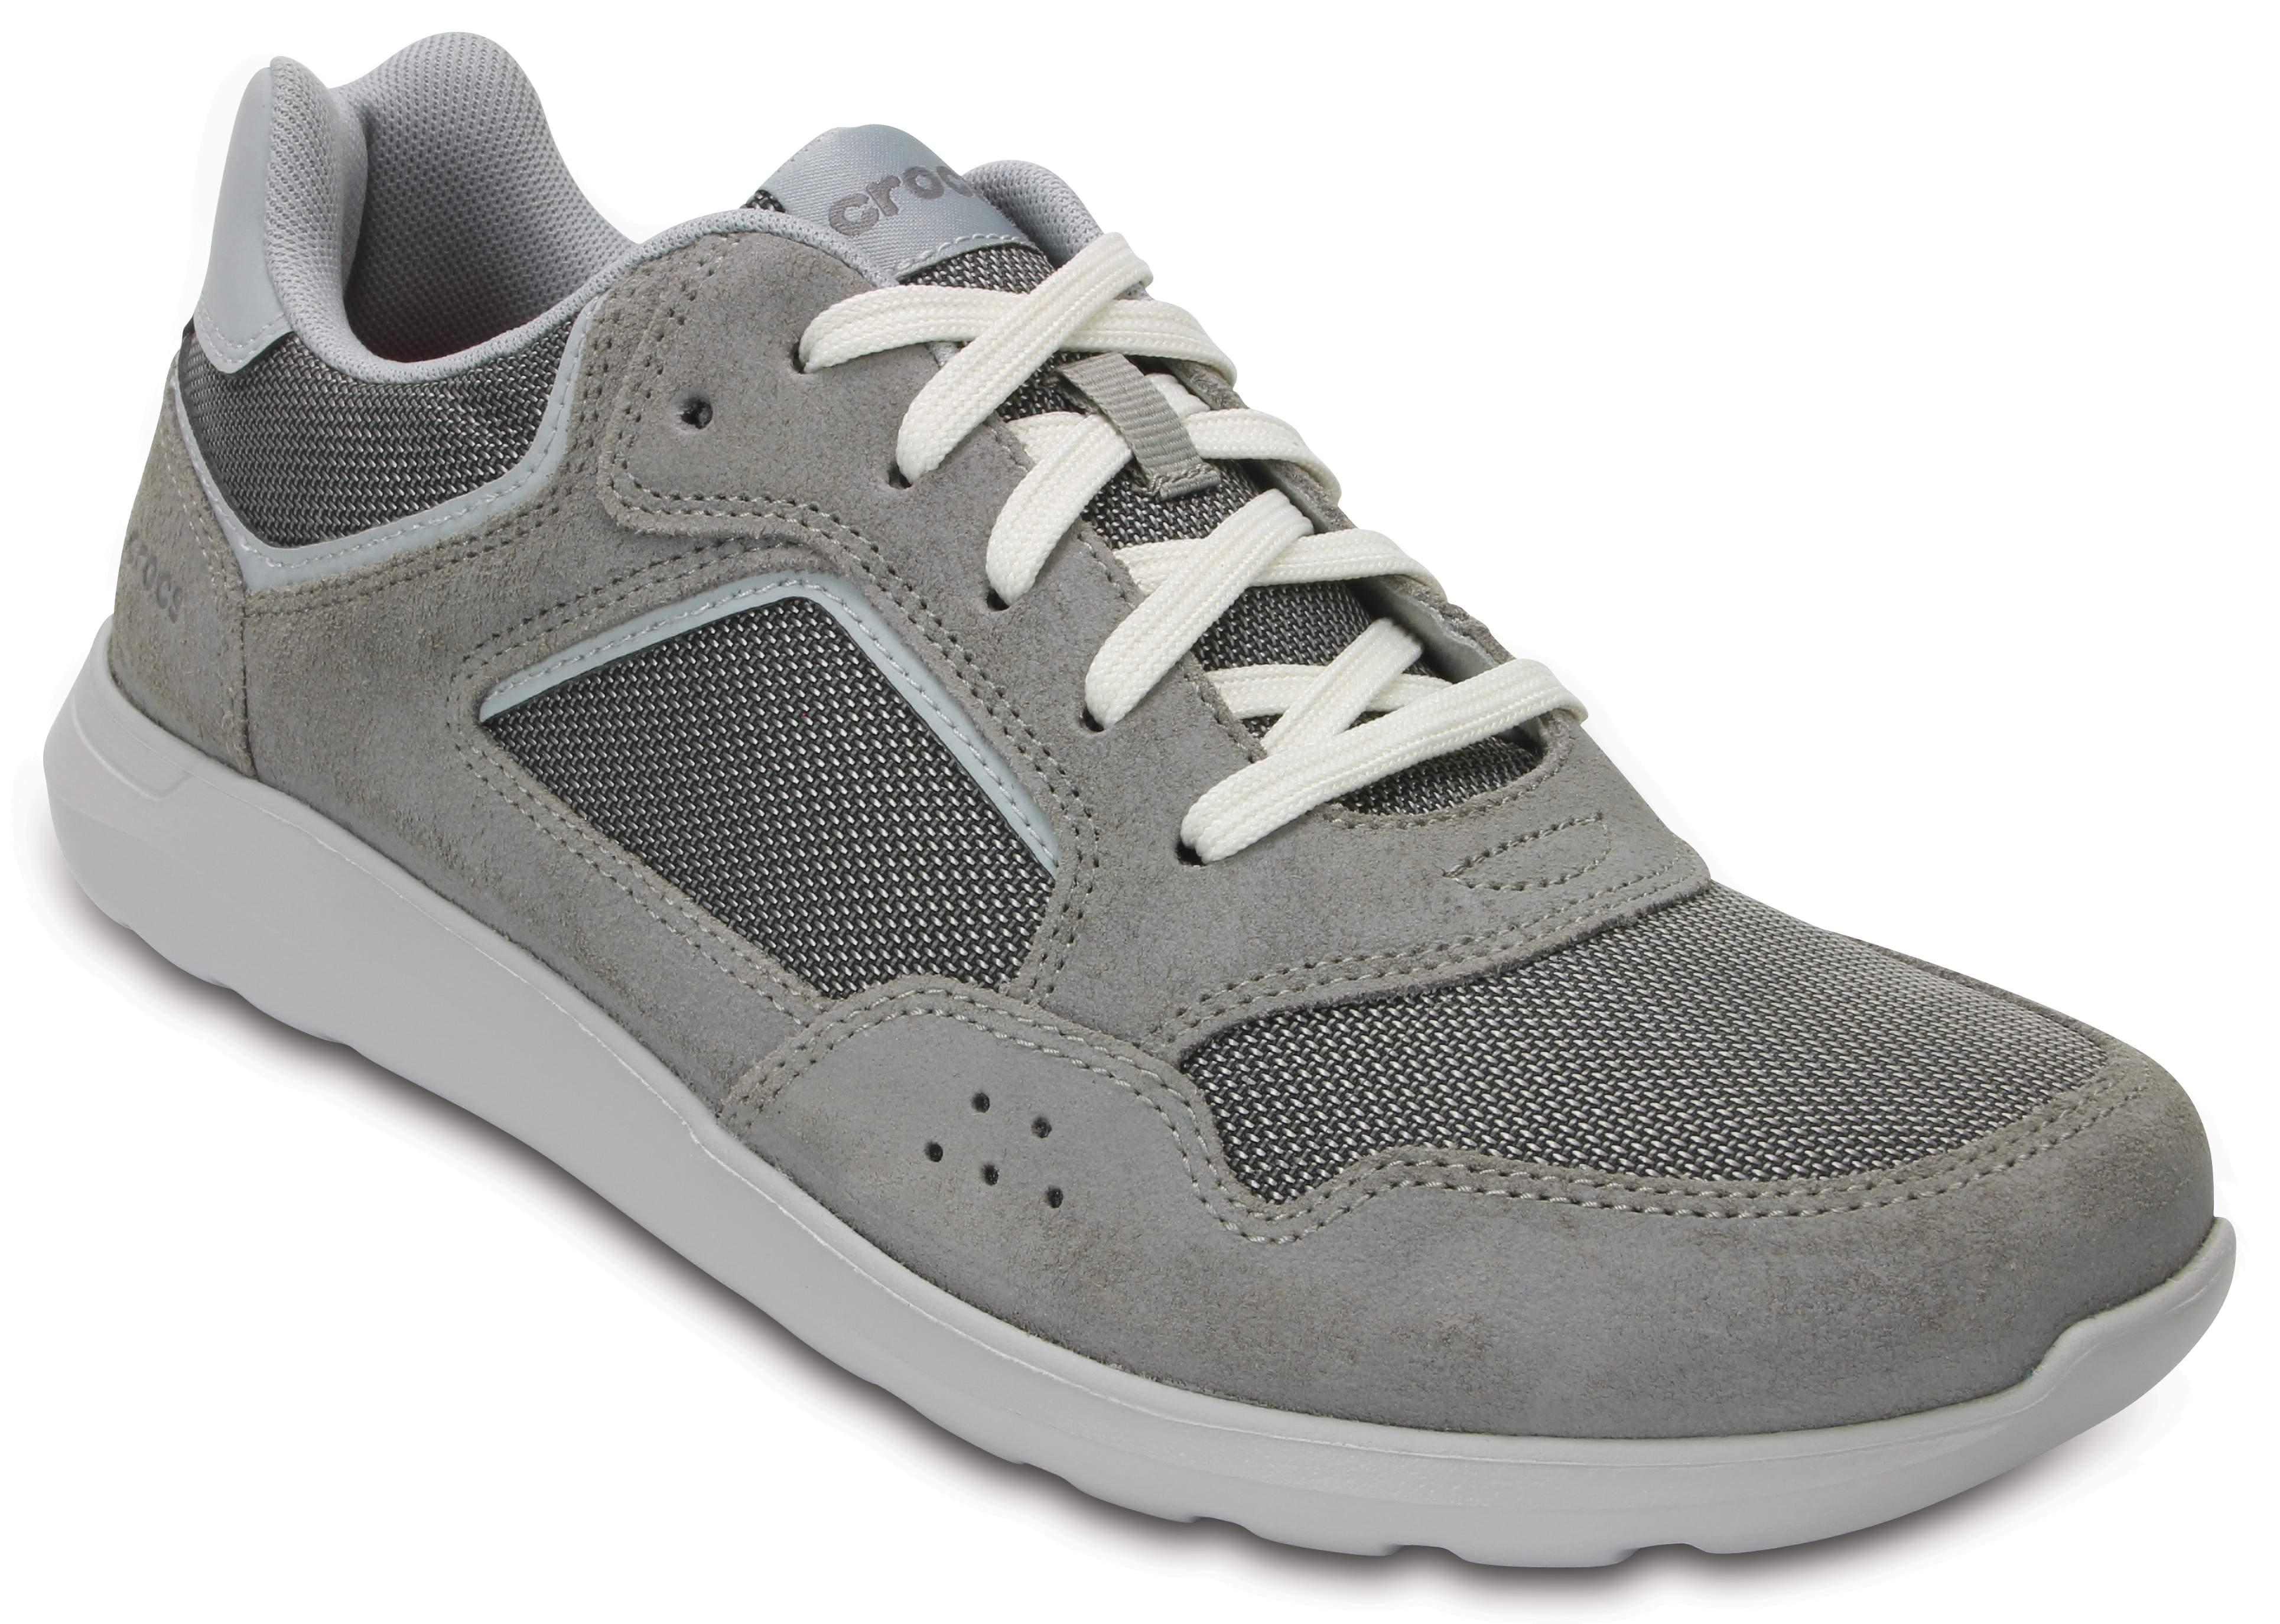 Crocs Men's Kinsale Pacer (Charcoal / Navy)